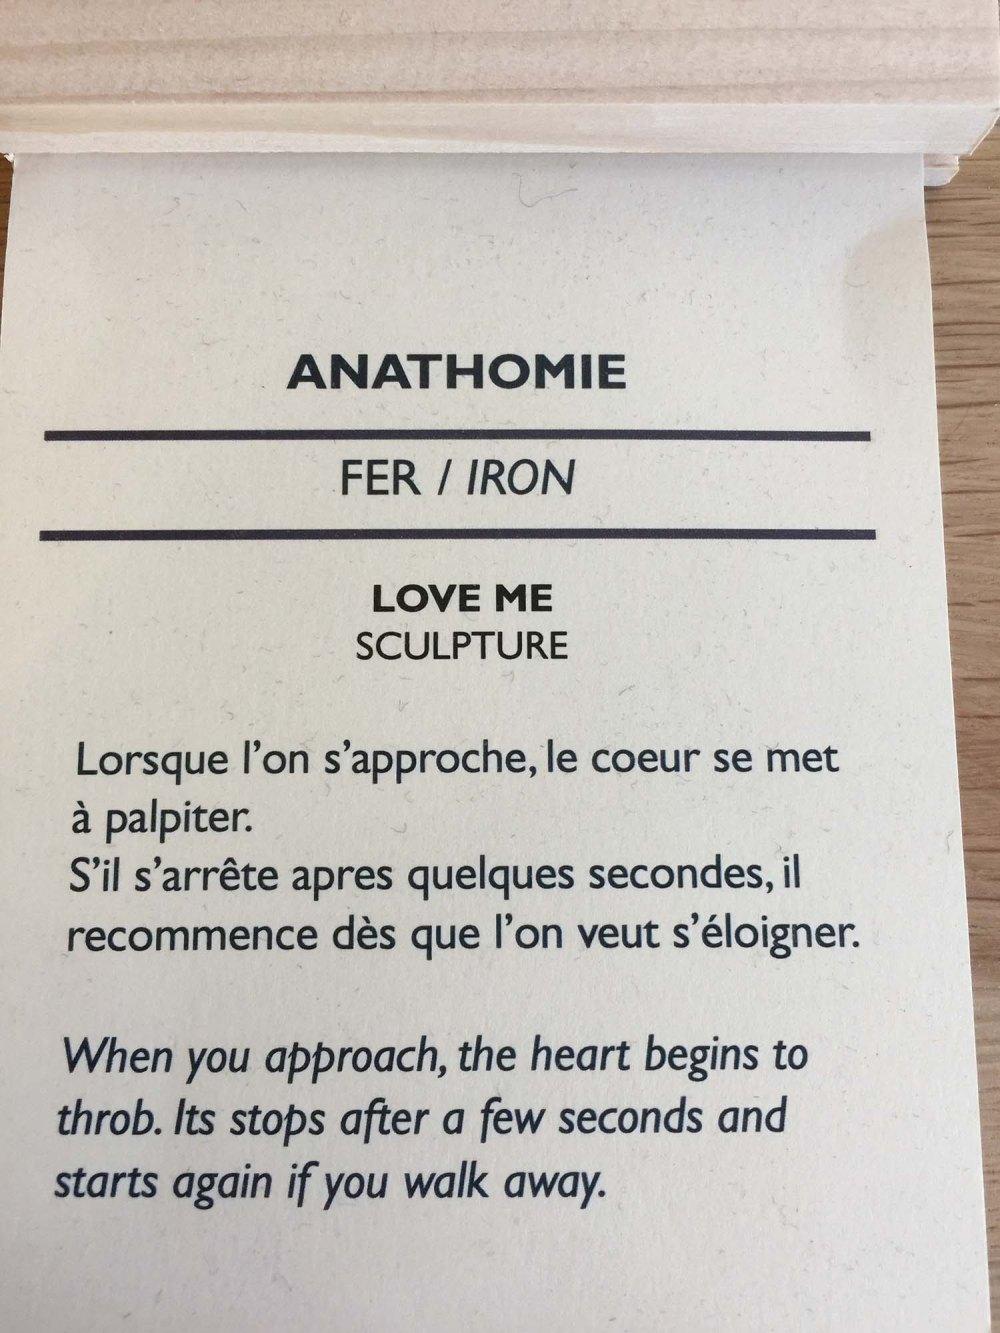 anathomie